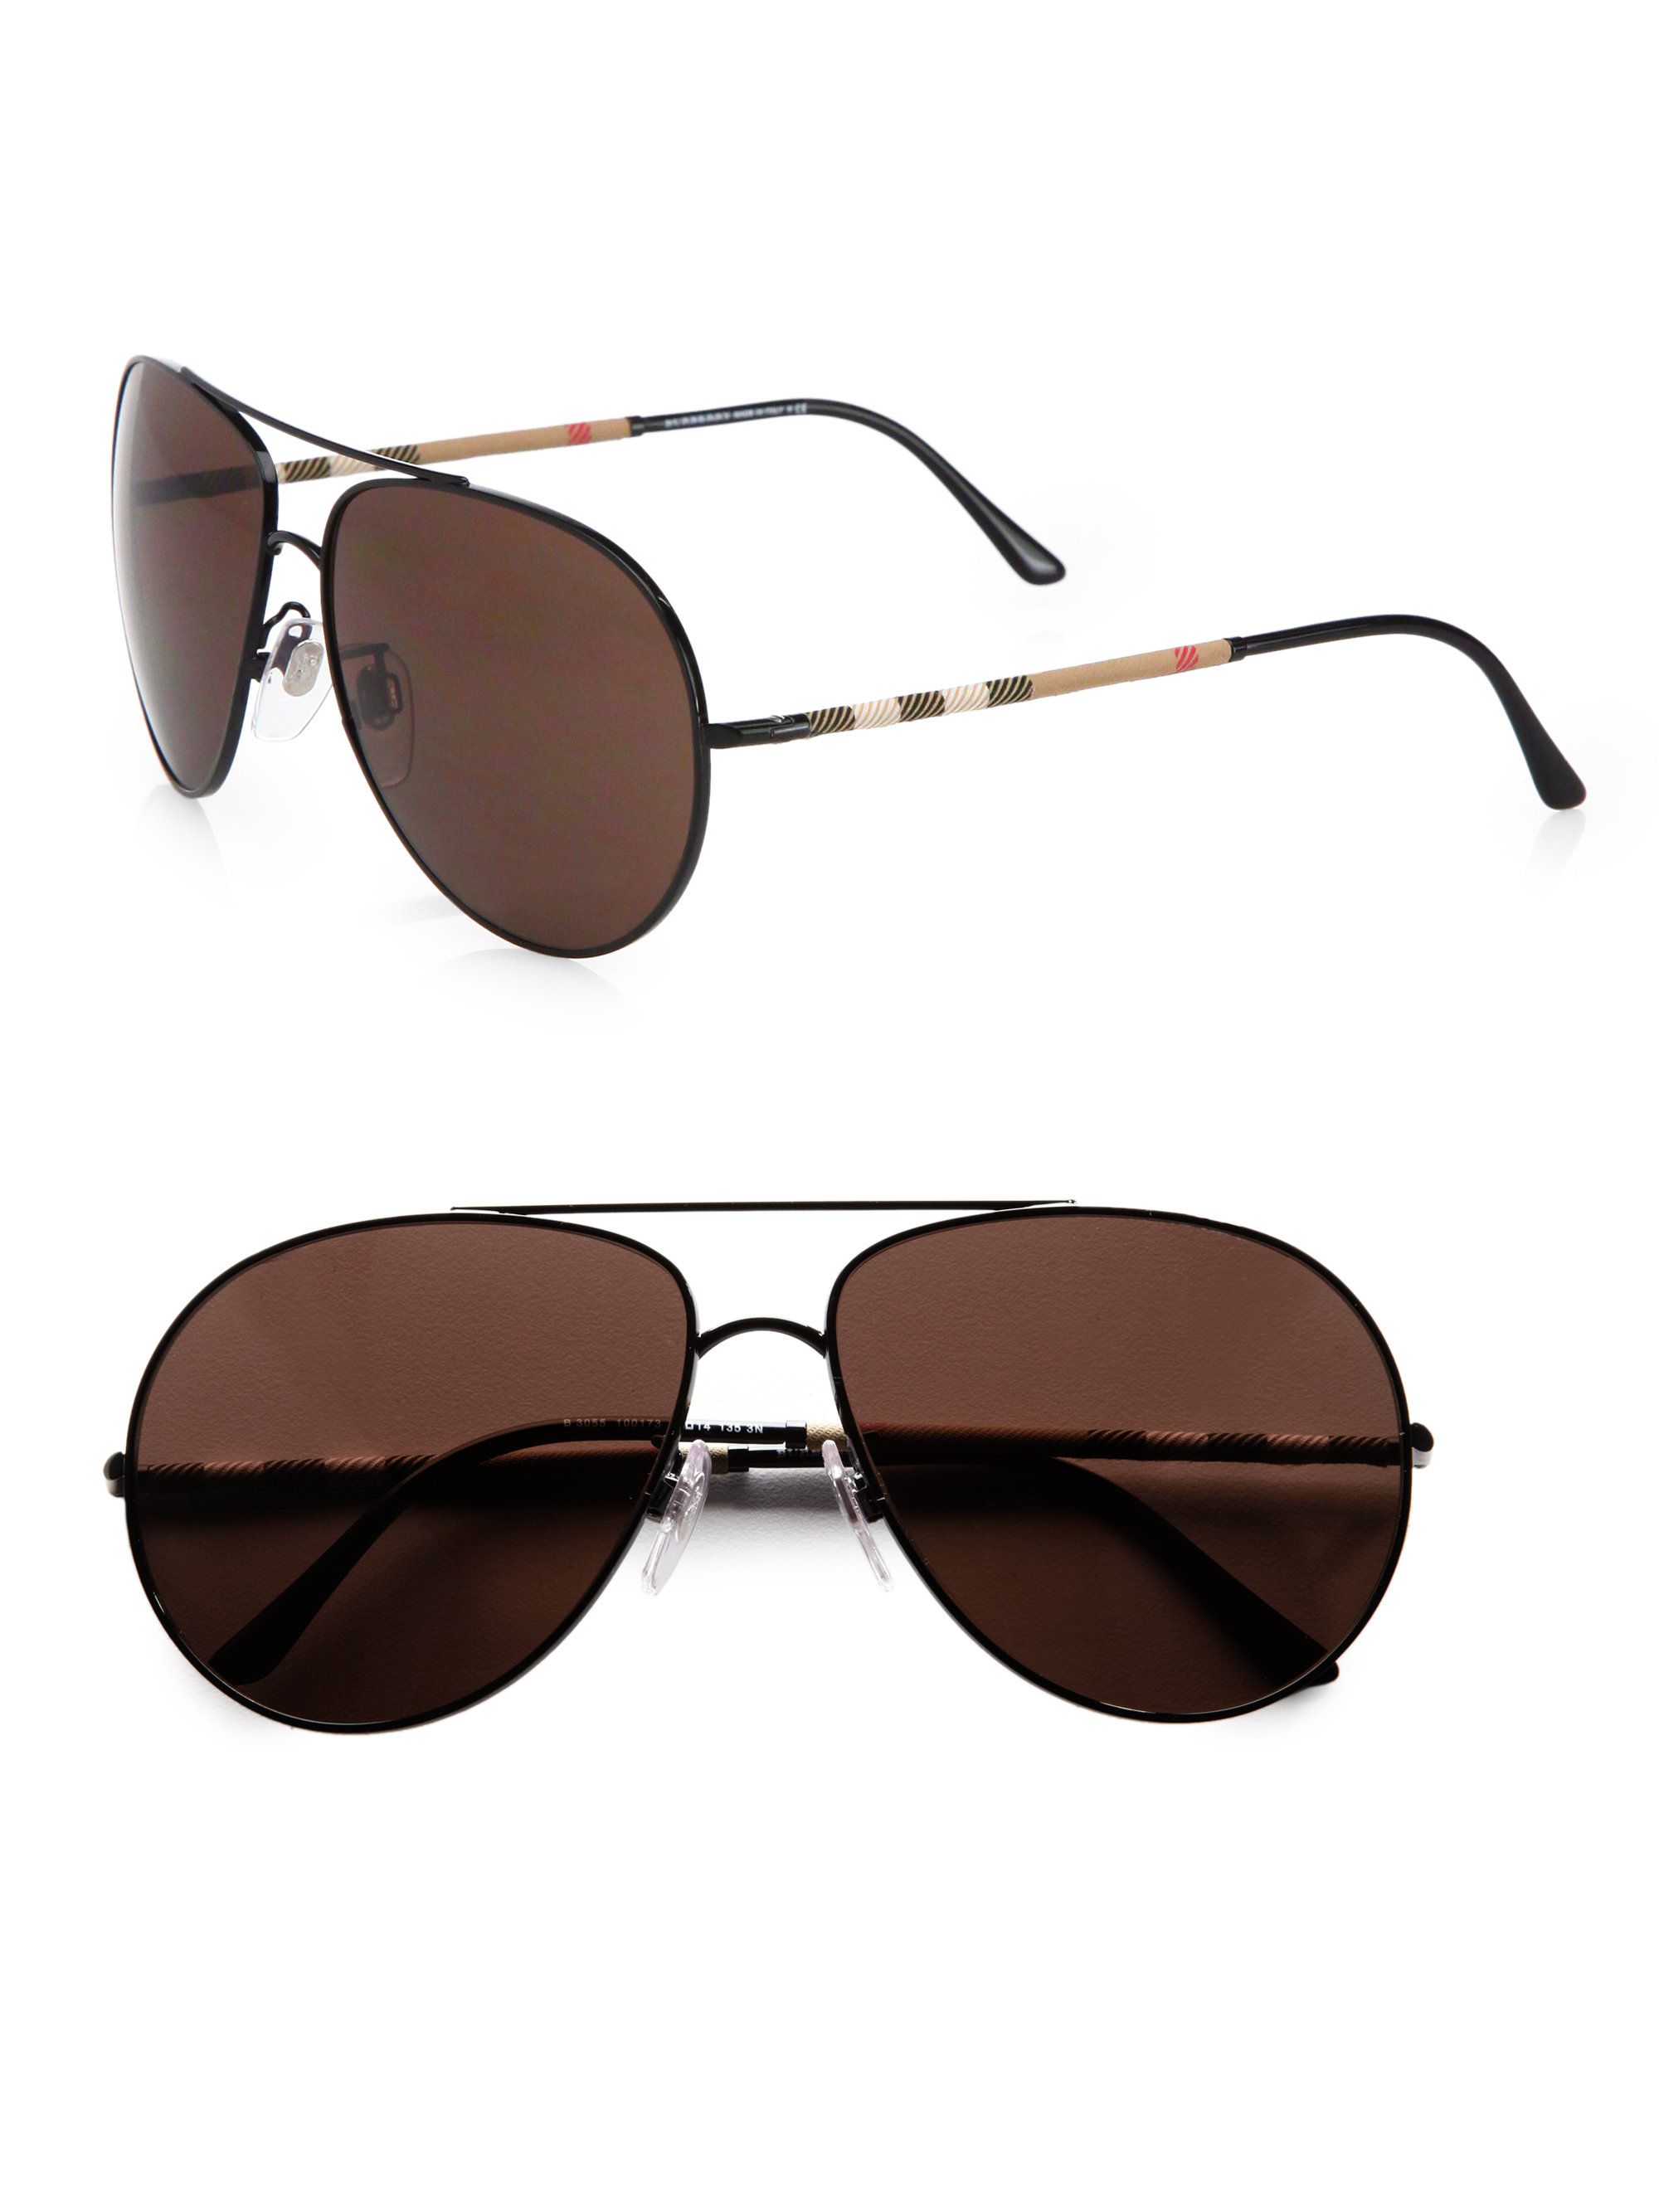 dbb3cb1a4de20 Lyst - Burberry Metal Aviator Sunglasses in Black for Men